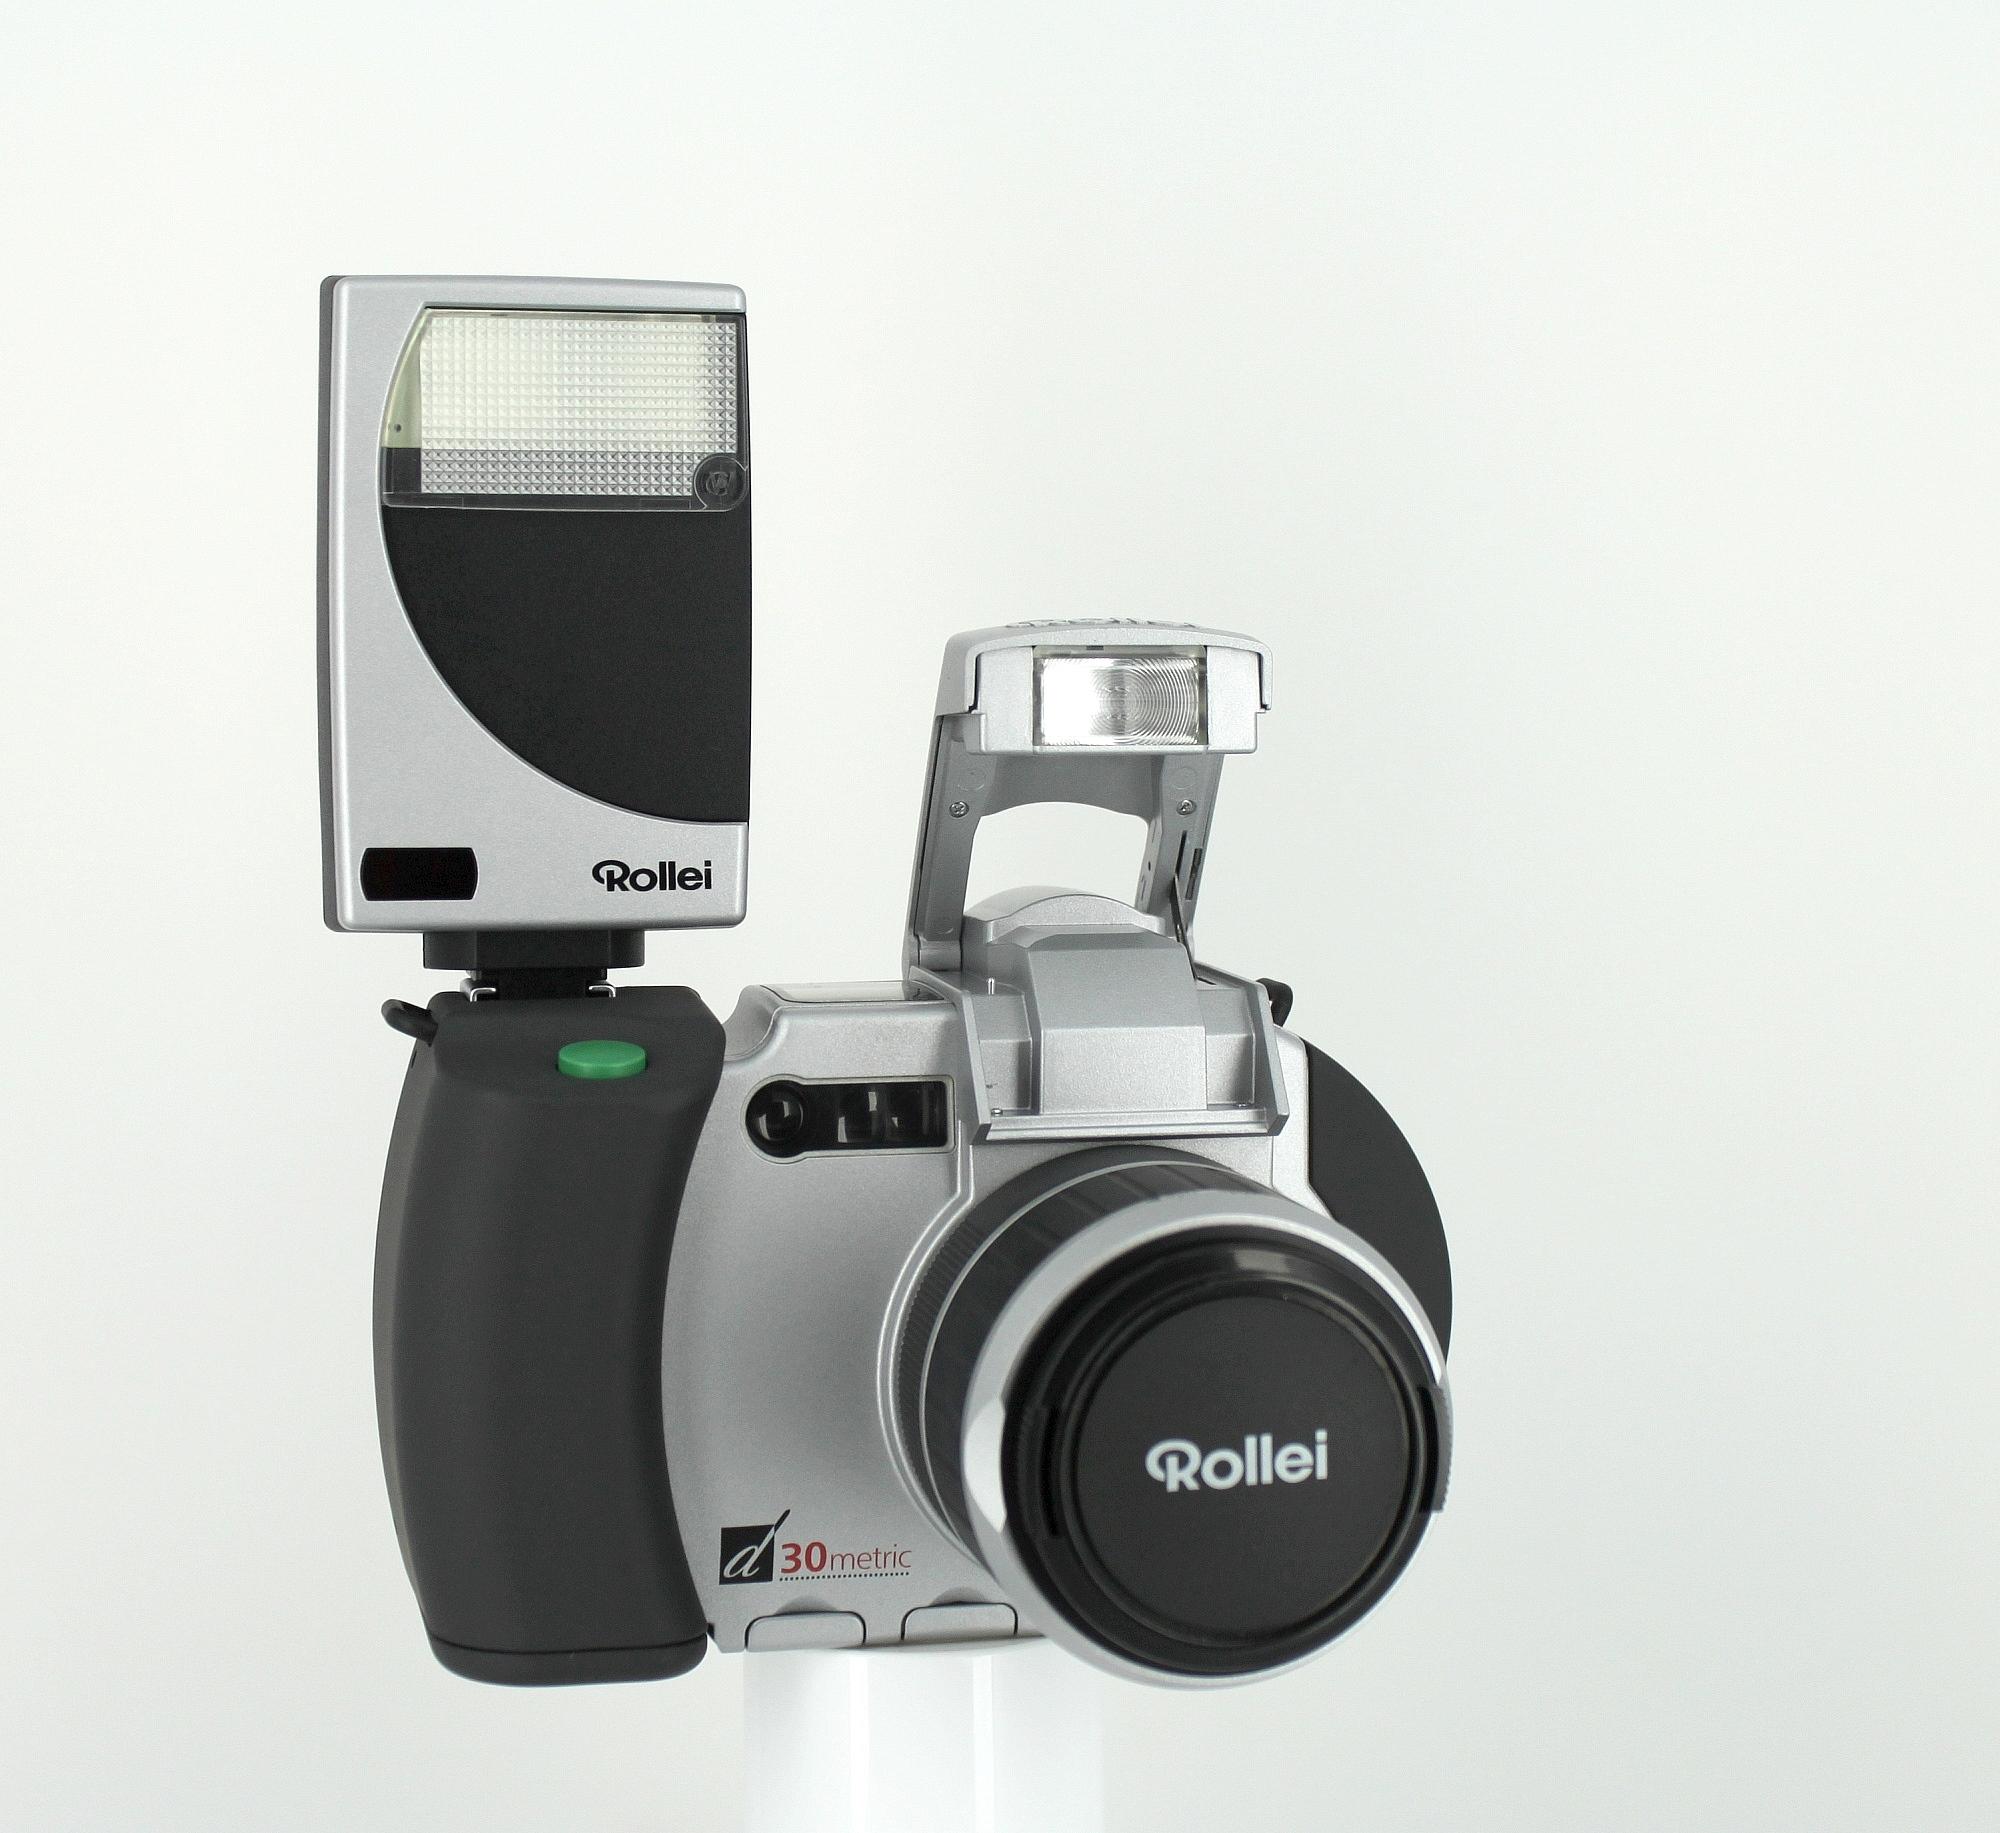 Rollei d30 metric (1998)